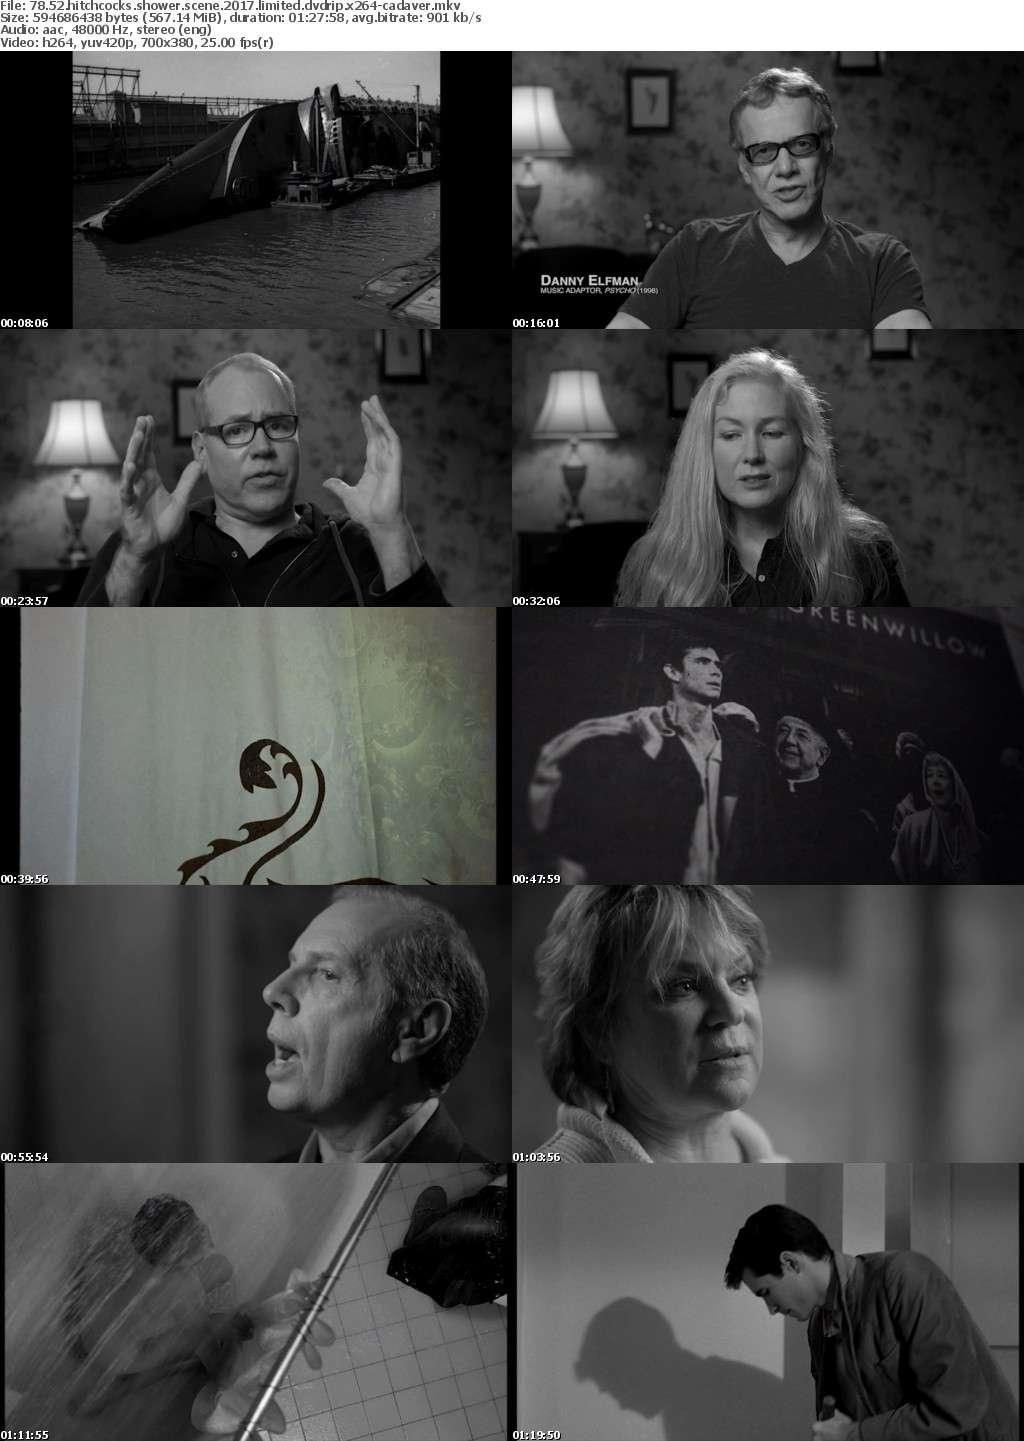 78 52 Hitchcocks Shower Scene 2017 LiMiTED DVDRip x264-CADAVER